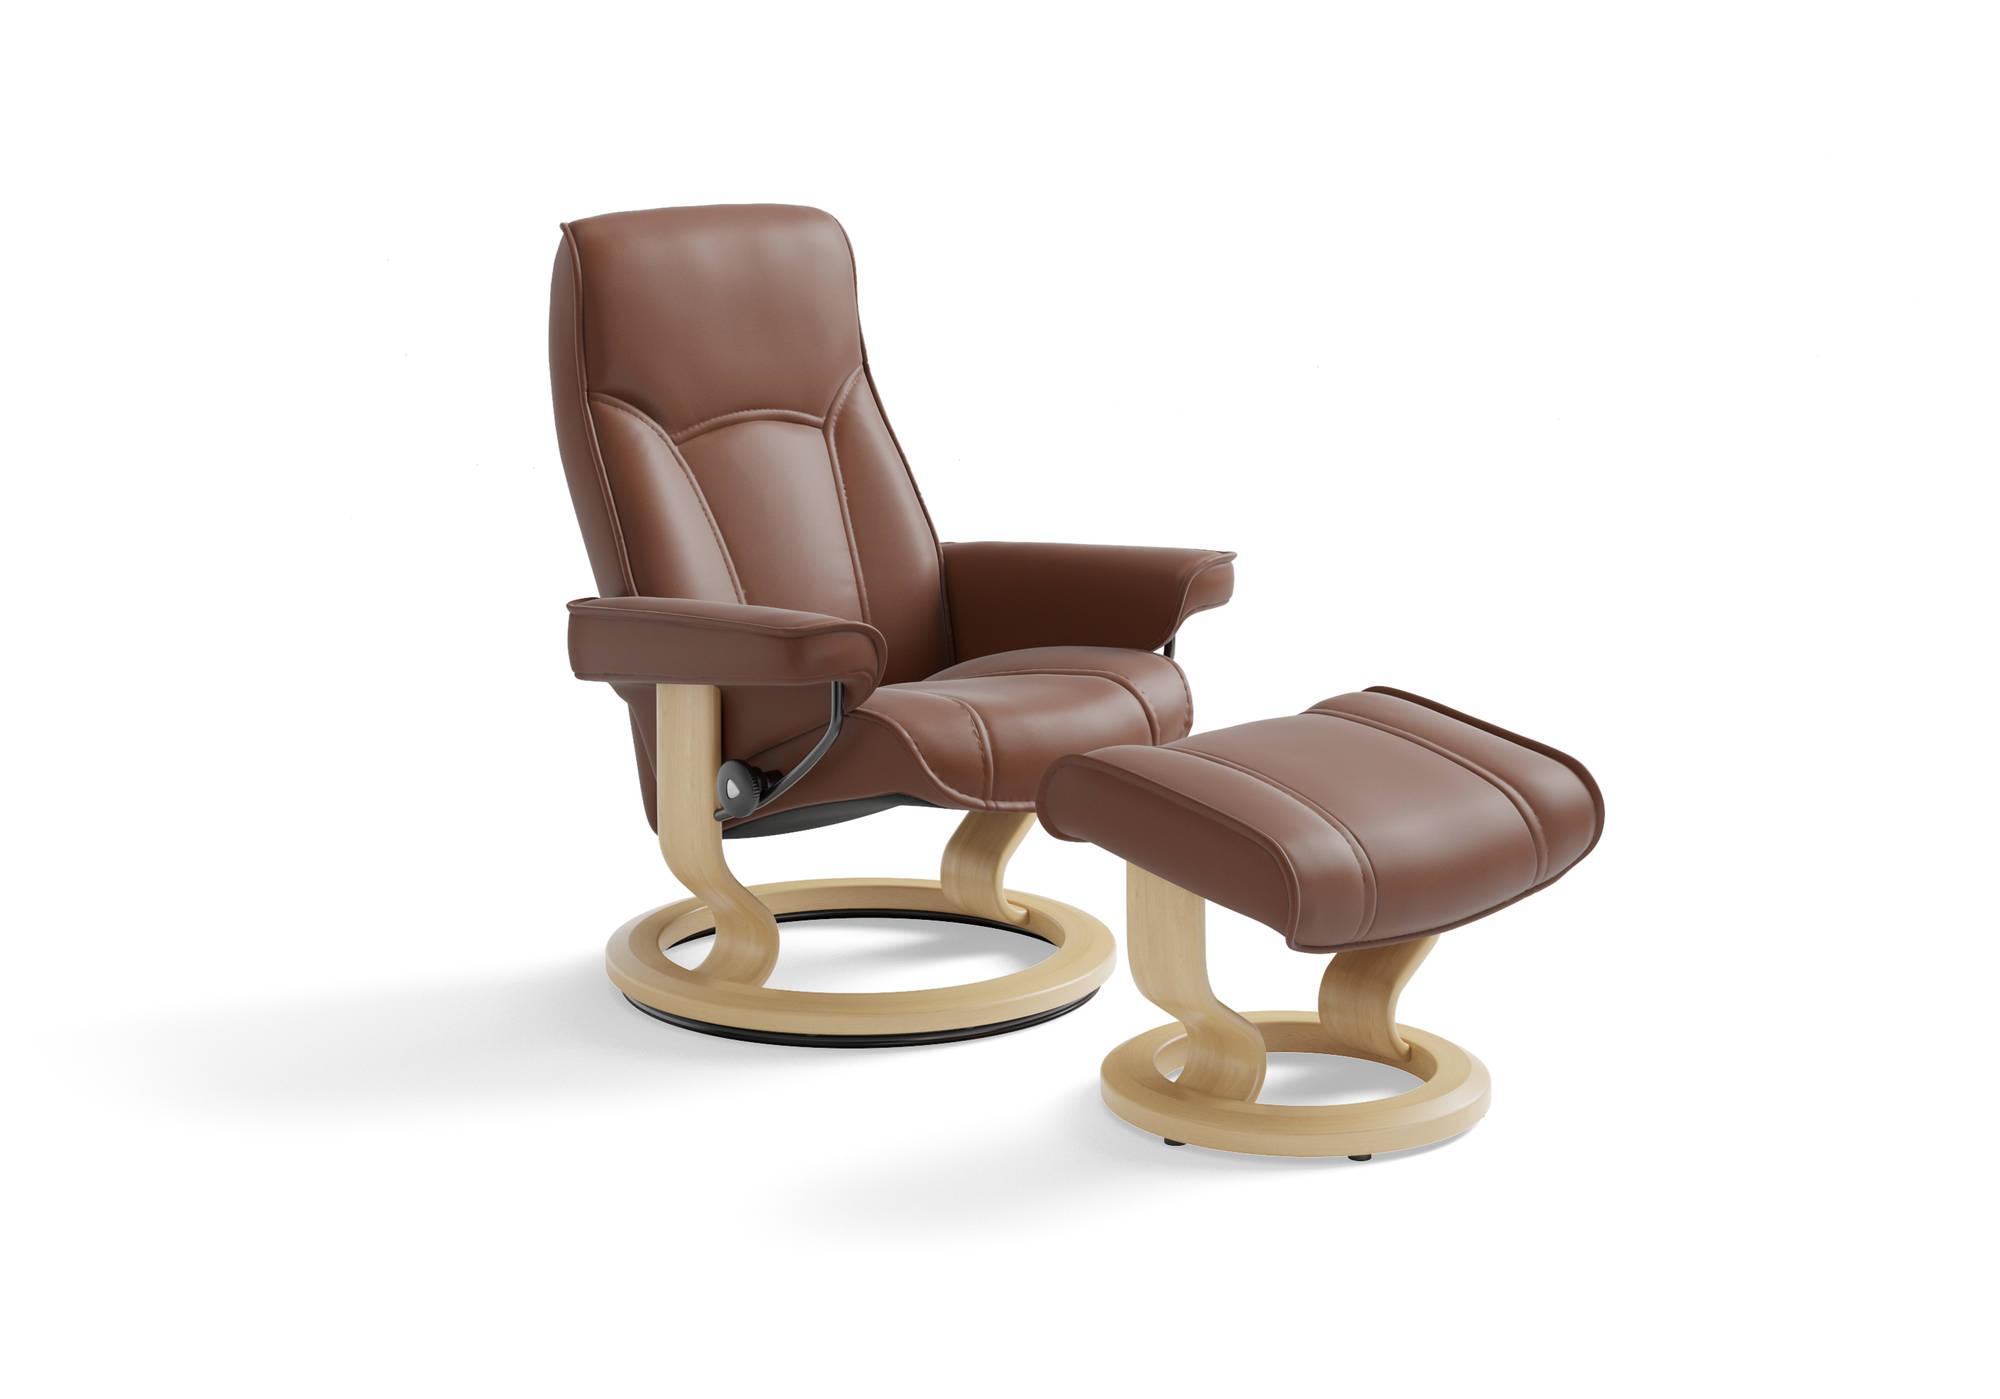 Superb More About Stressless Scan Decor Unemploymentrelief Wooden Chair Designs For Living Room Unemploymentrelieforg